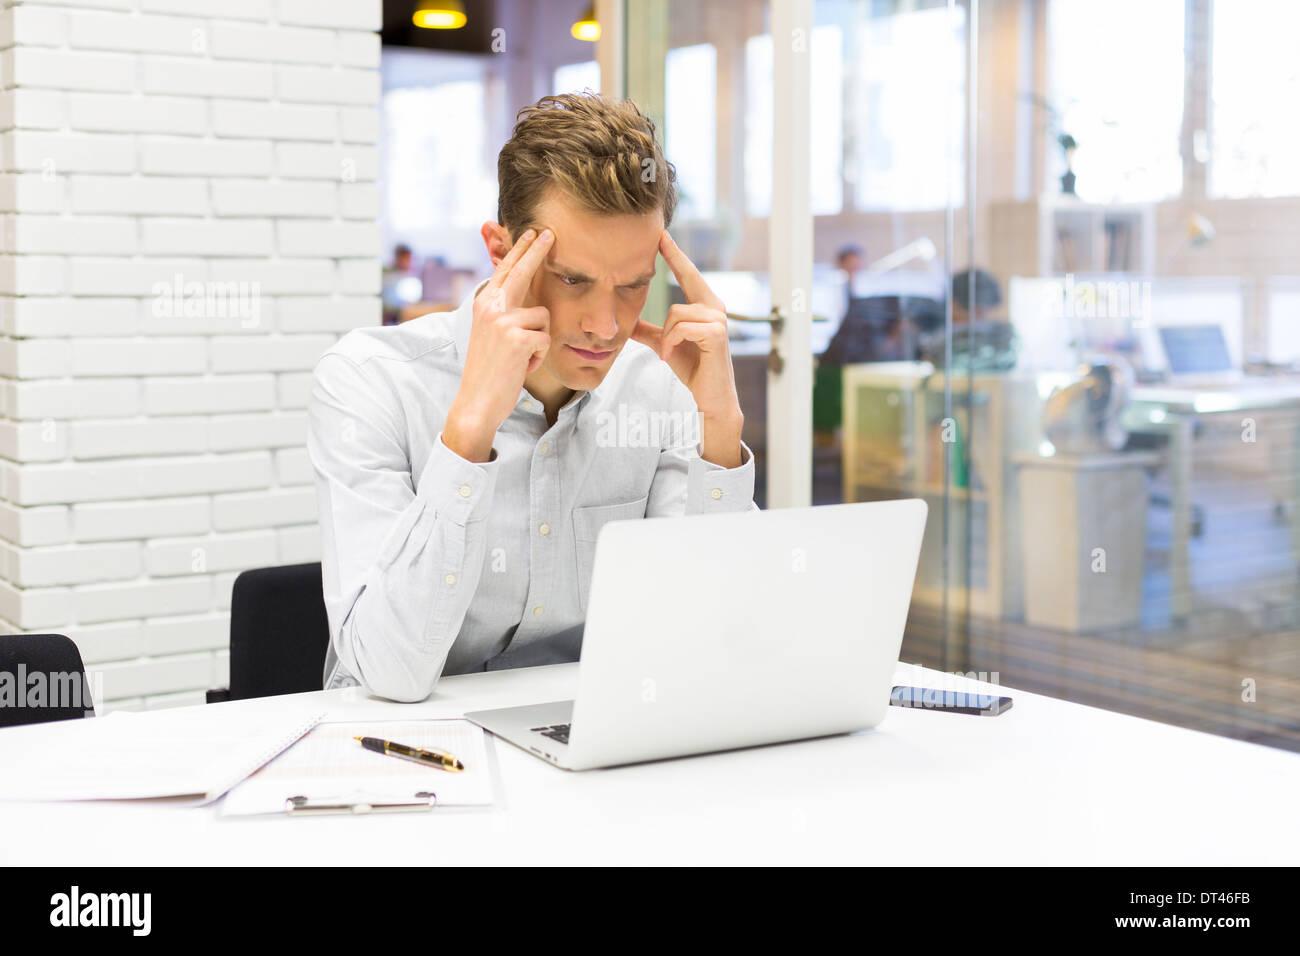 Maschio di business desk computer start-up Immagini Stock